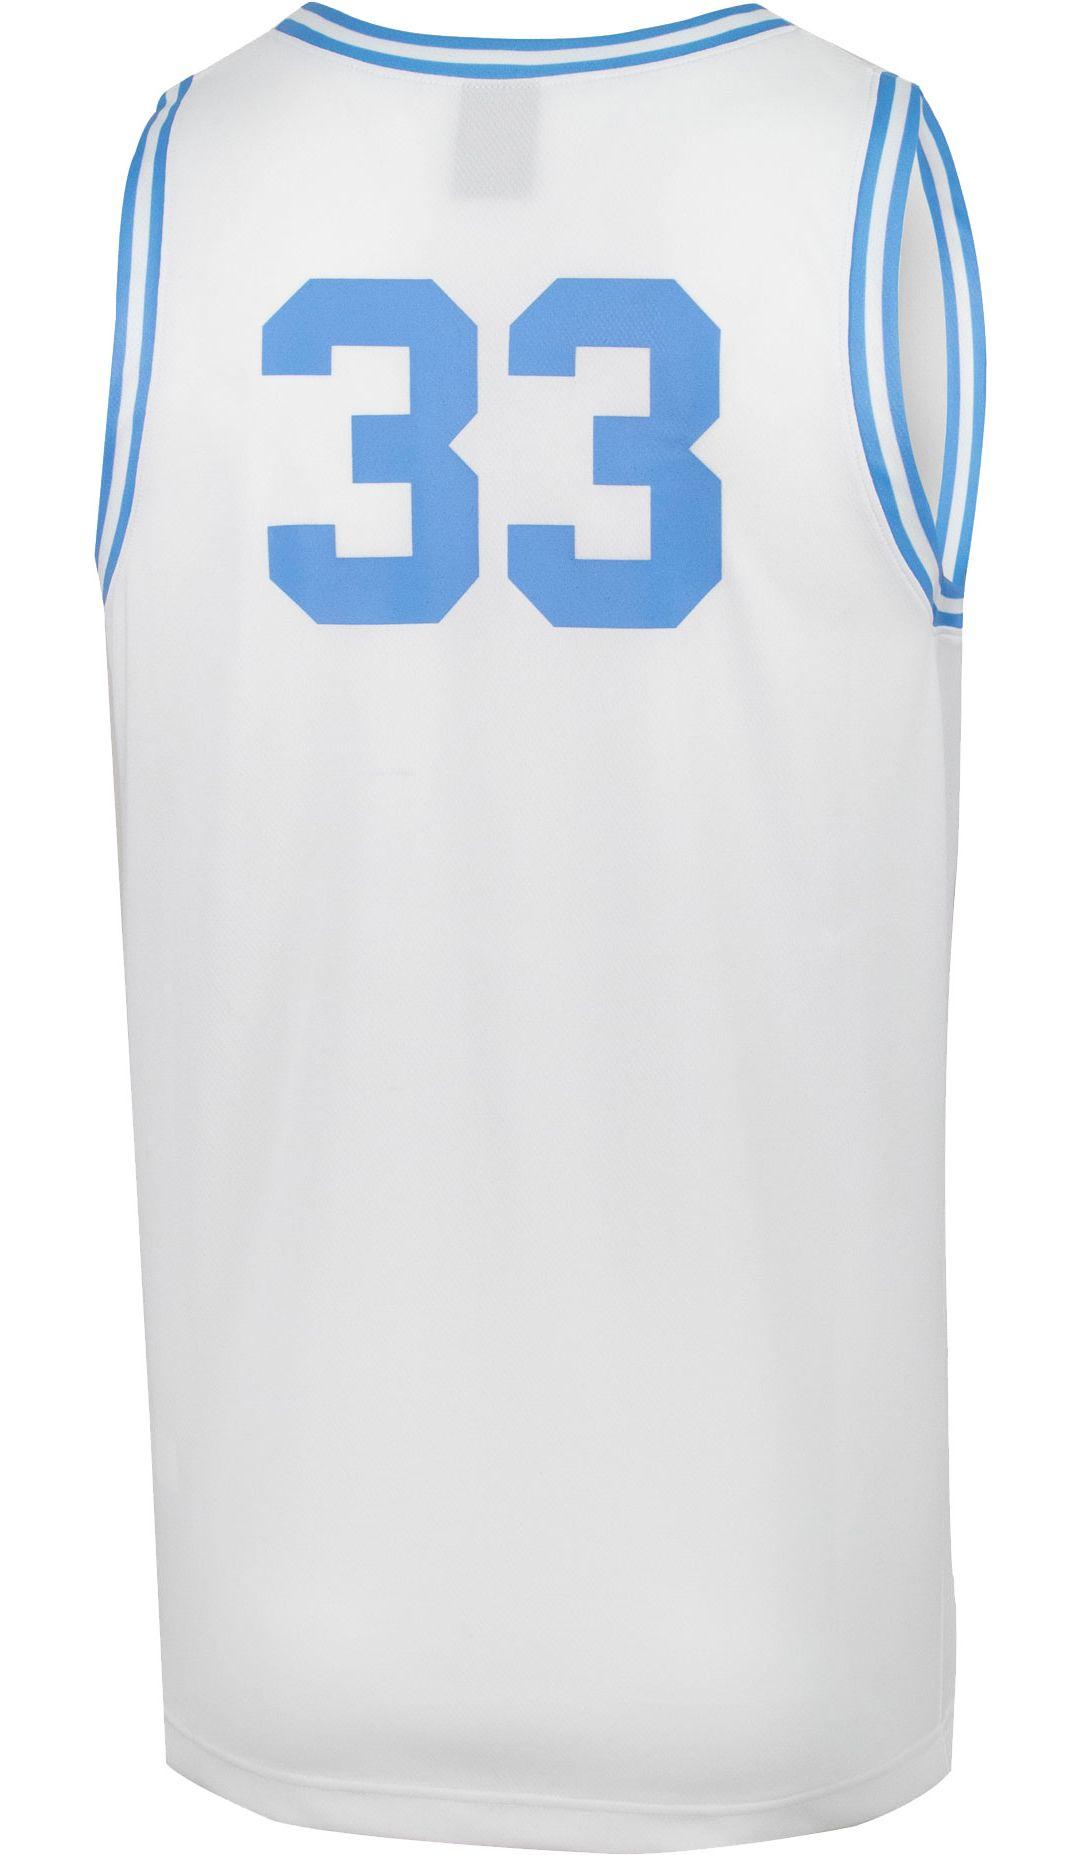 5c62676b2a12 Jordan Men s North Carolina Tar Heels  33 Retro Replica Basketball White  Jersey 3